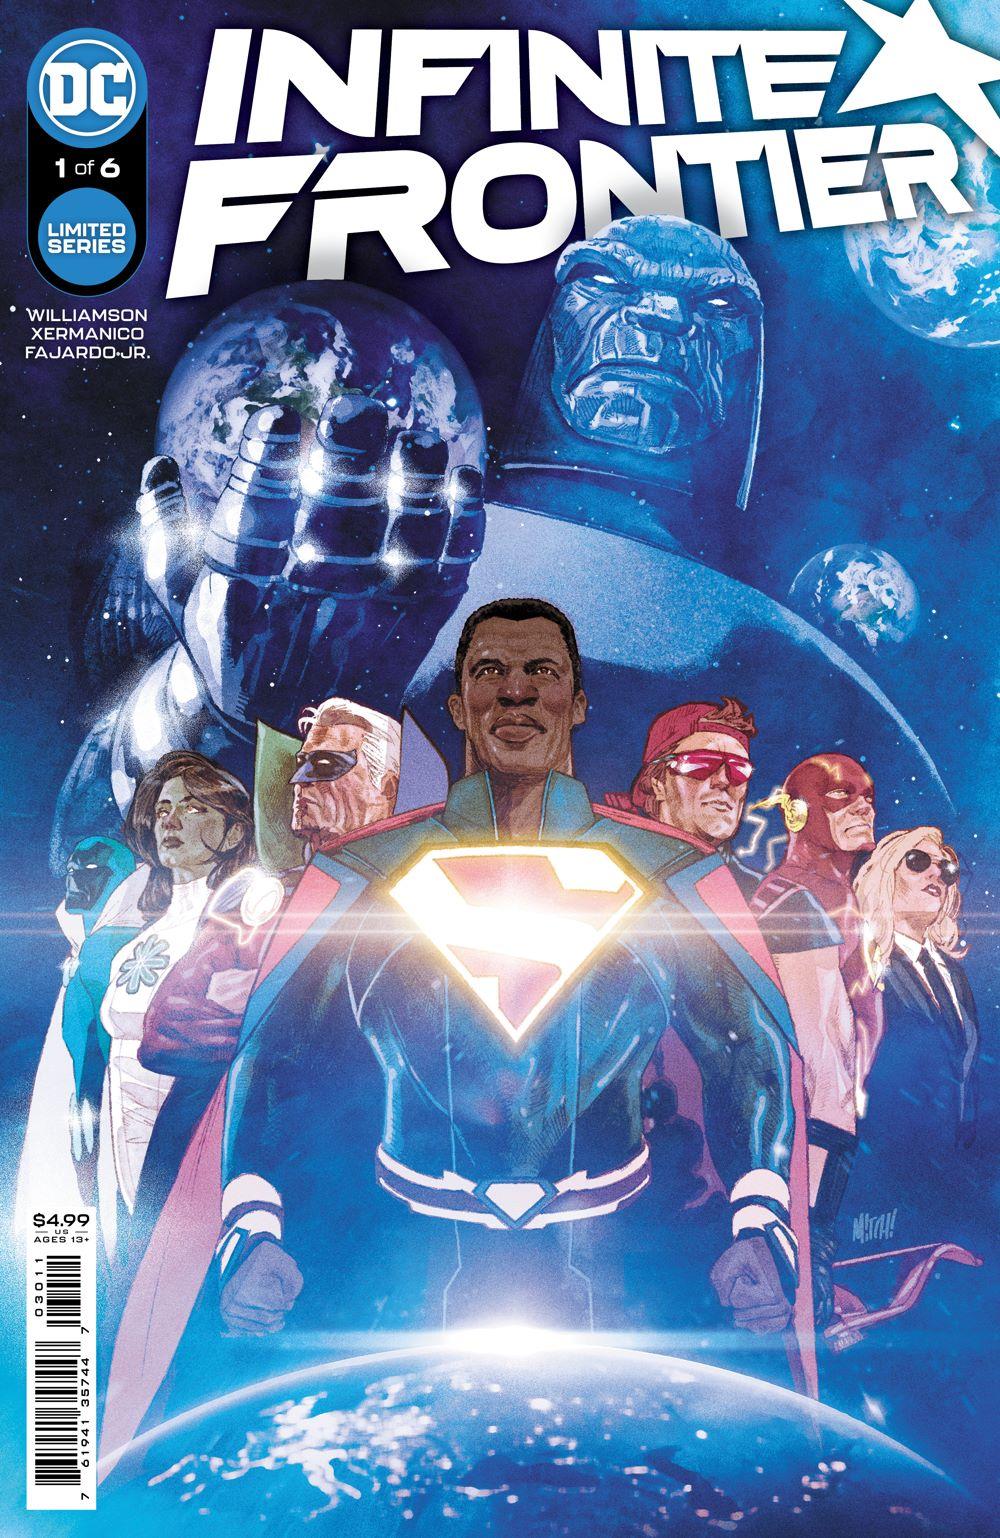 INFINITE_FRONTIER_Cv1 DC Comics June 2021 Solicitations